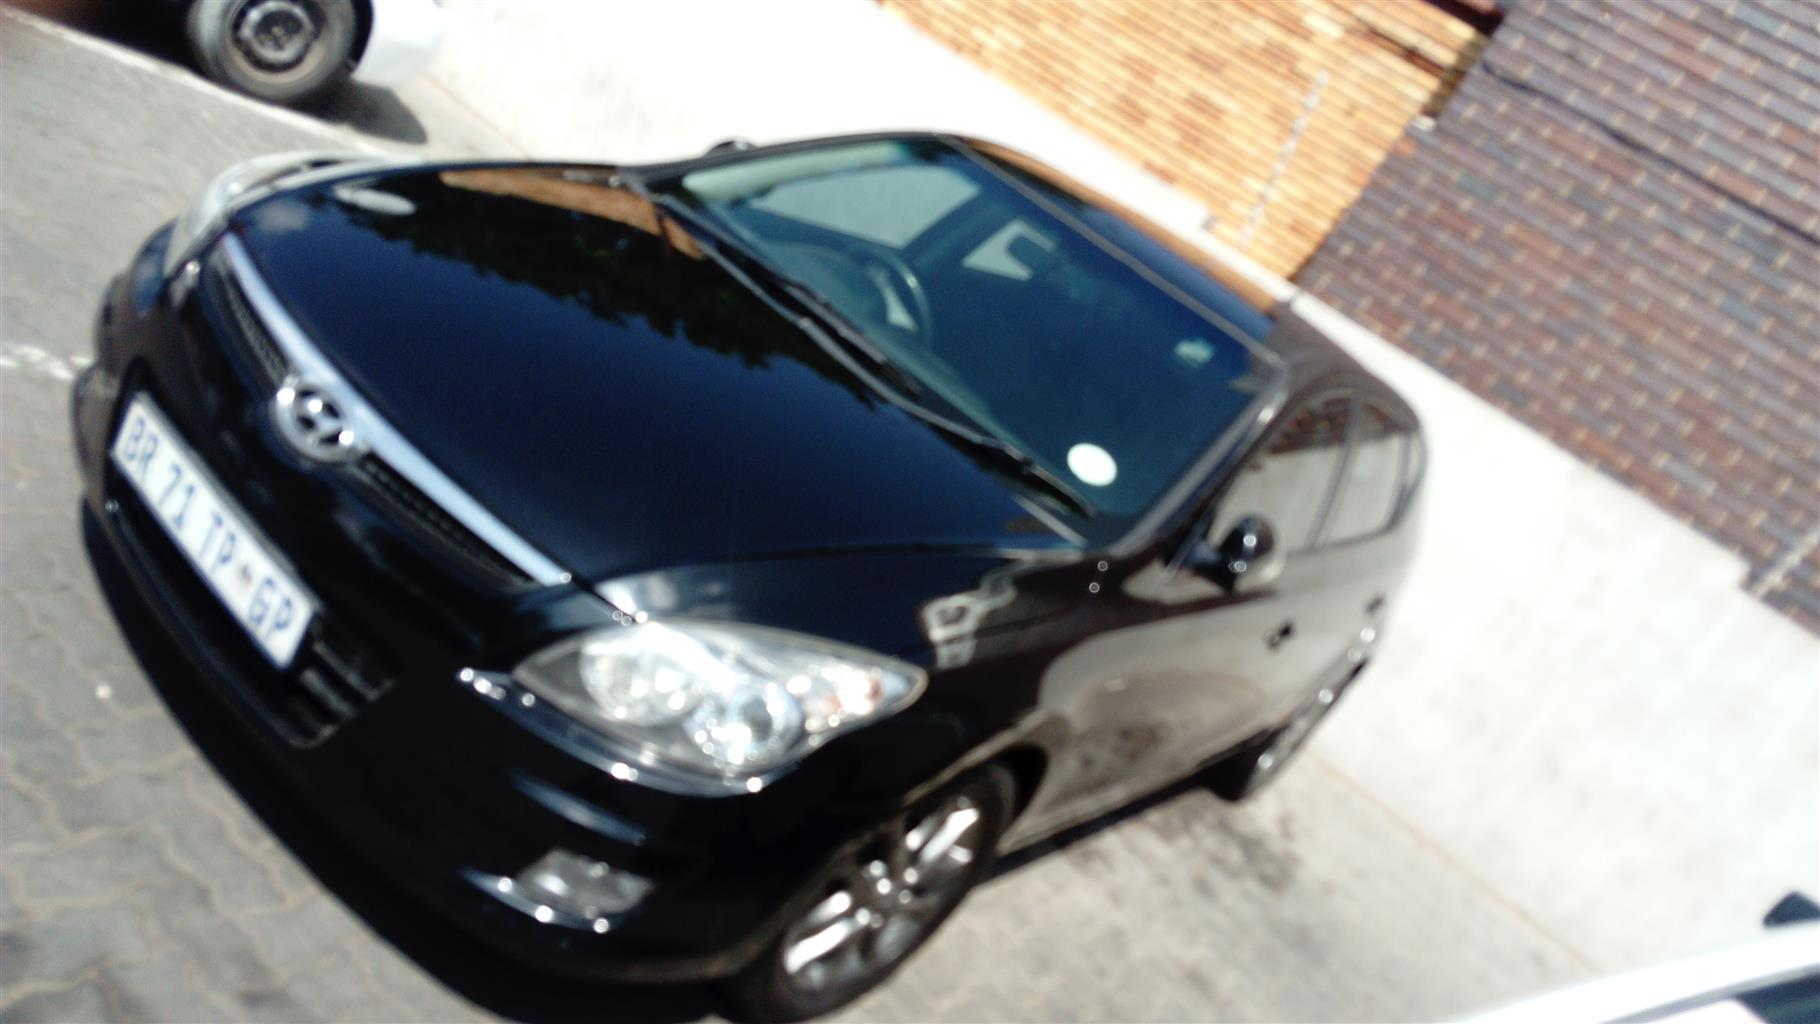 2012 Hyundai i30 1.6 GLS for sale very good conditon with 2keys